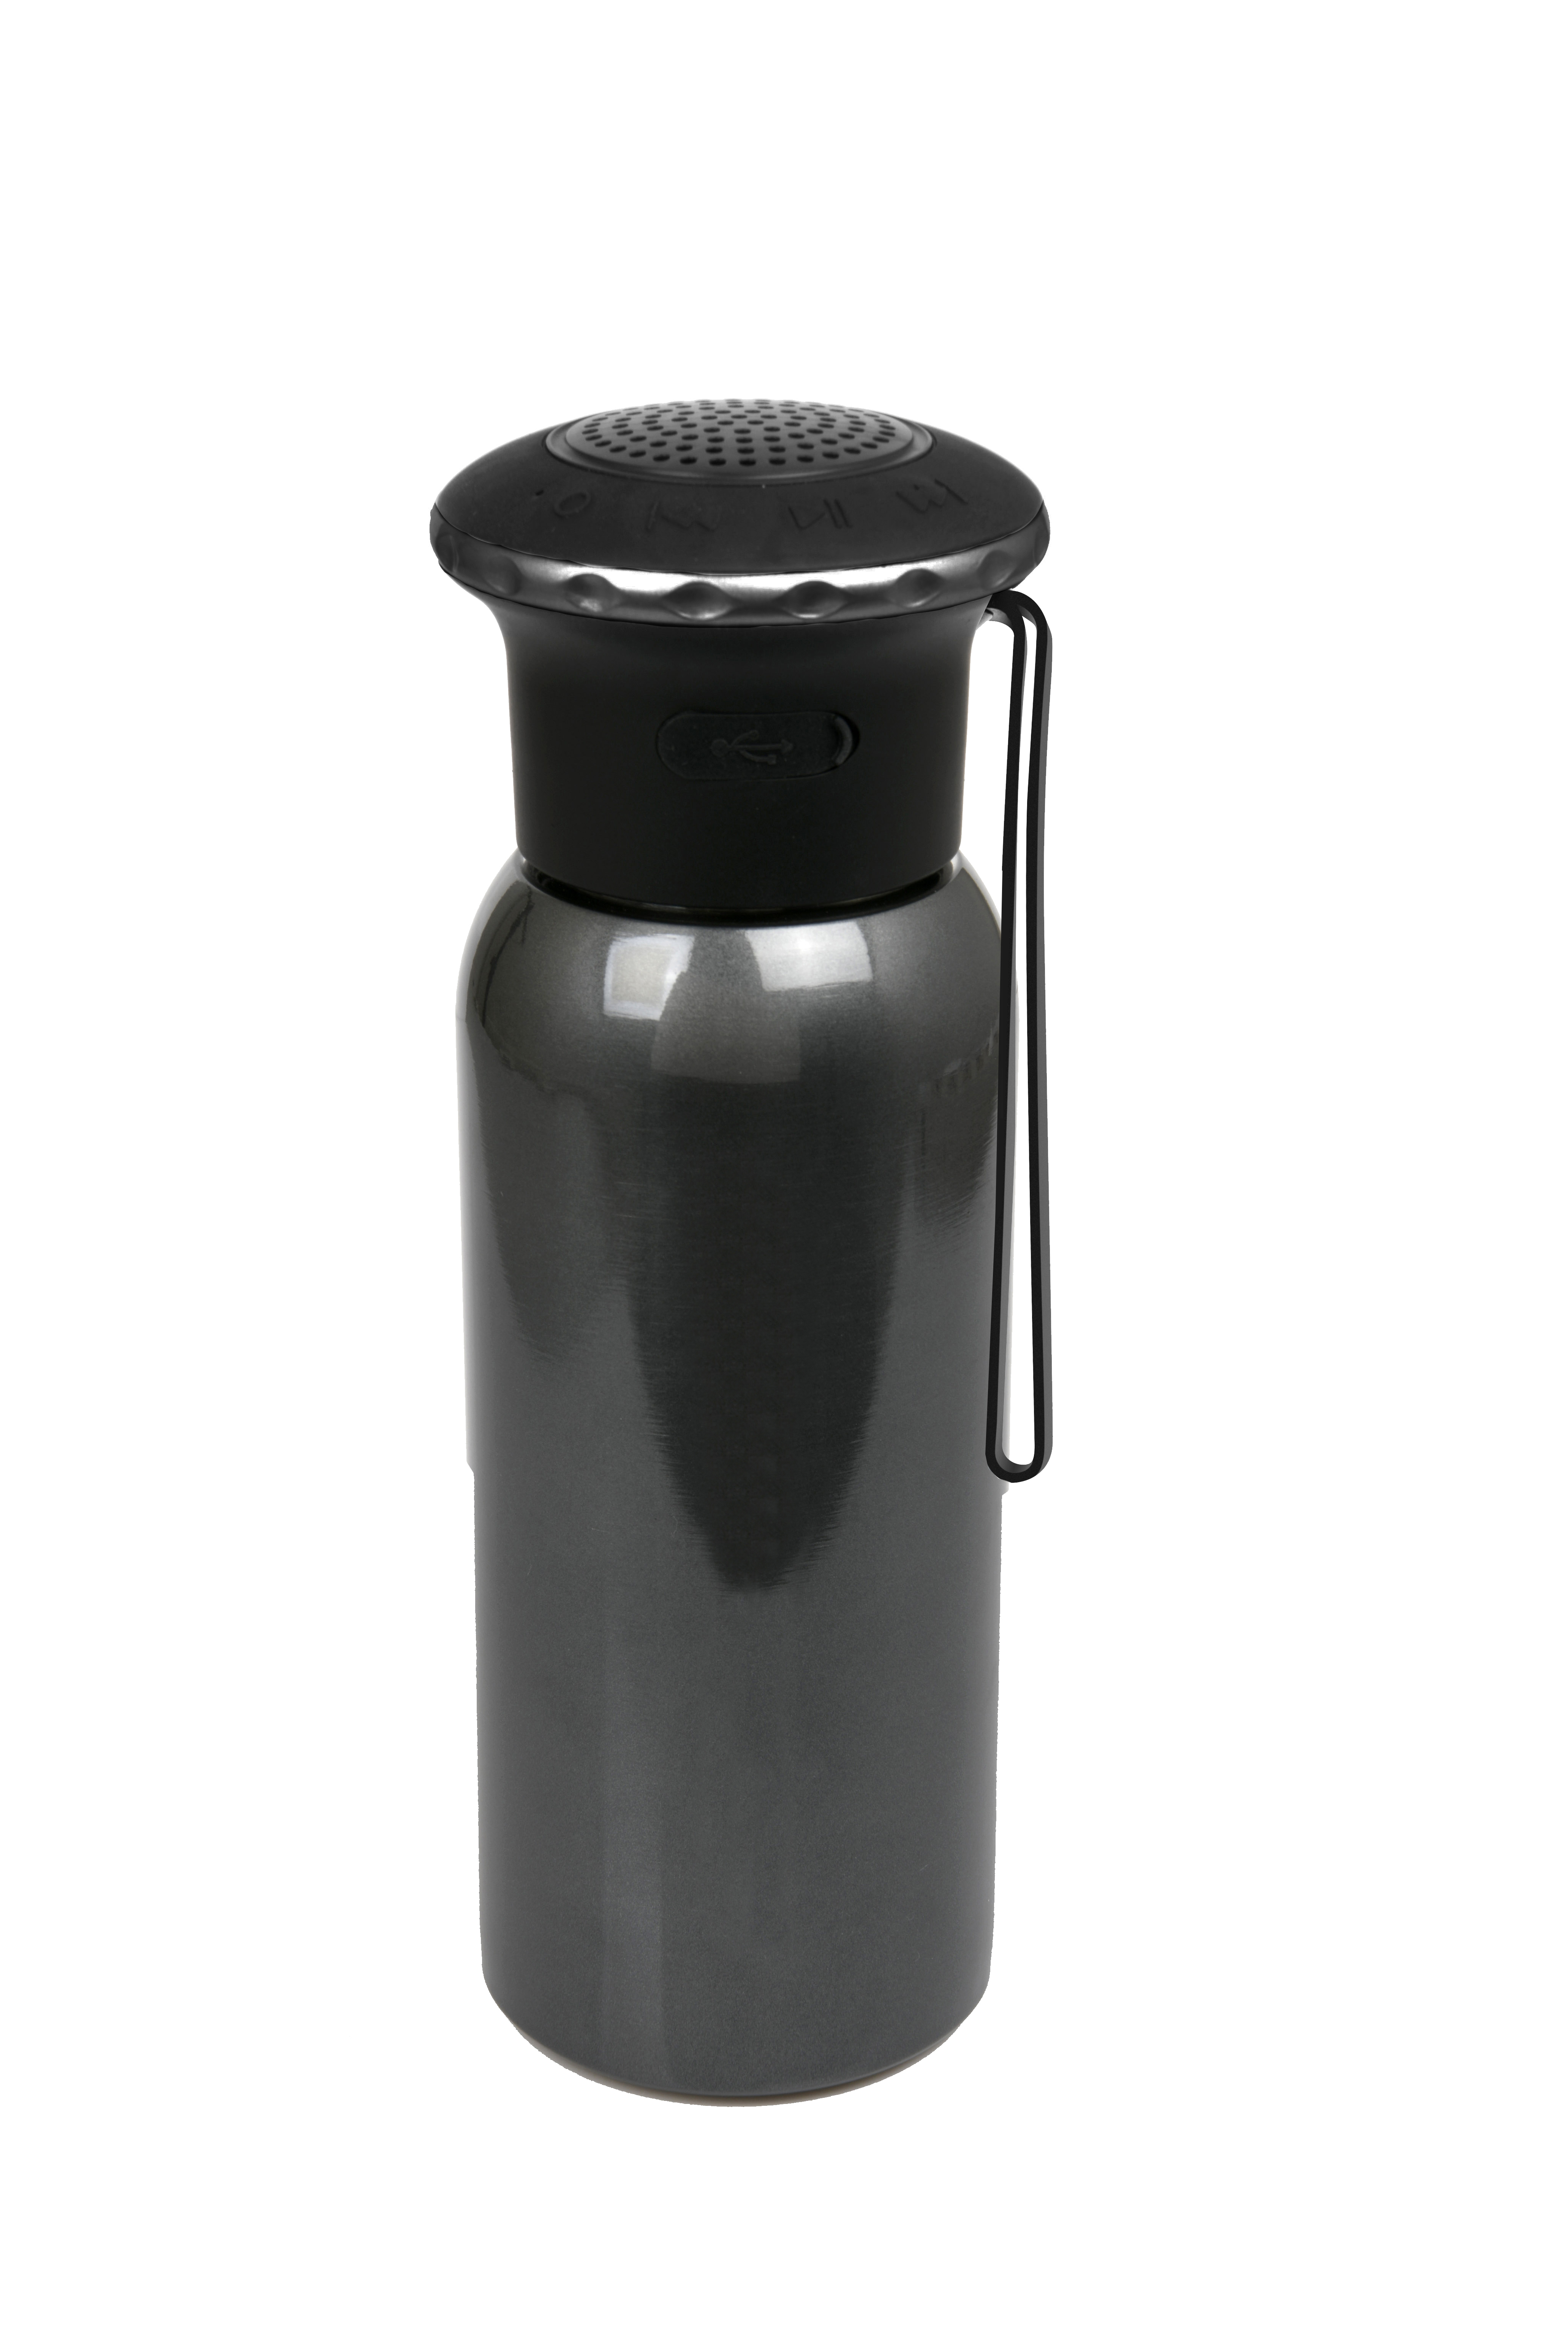 Enceinte bouteille isotherme en acier inoxydable